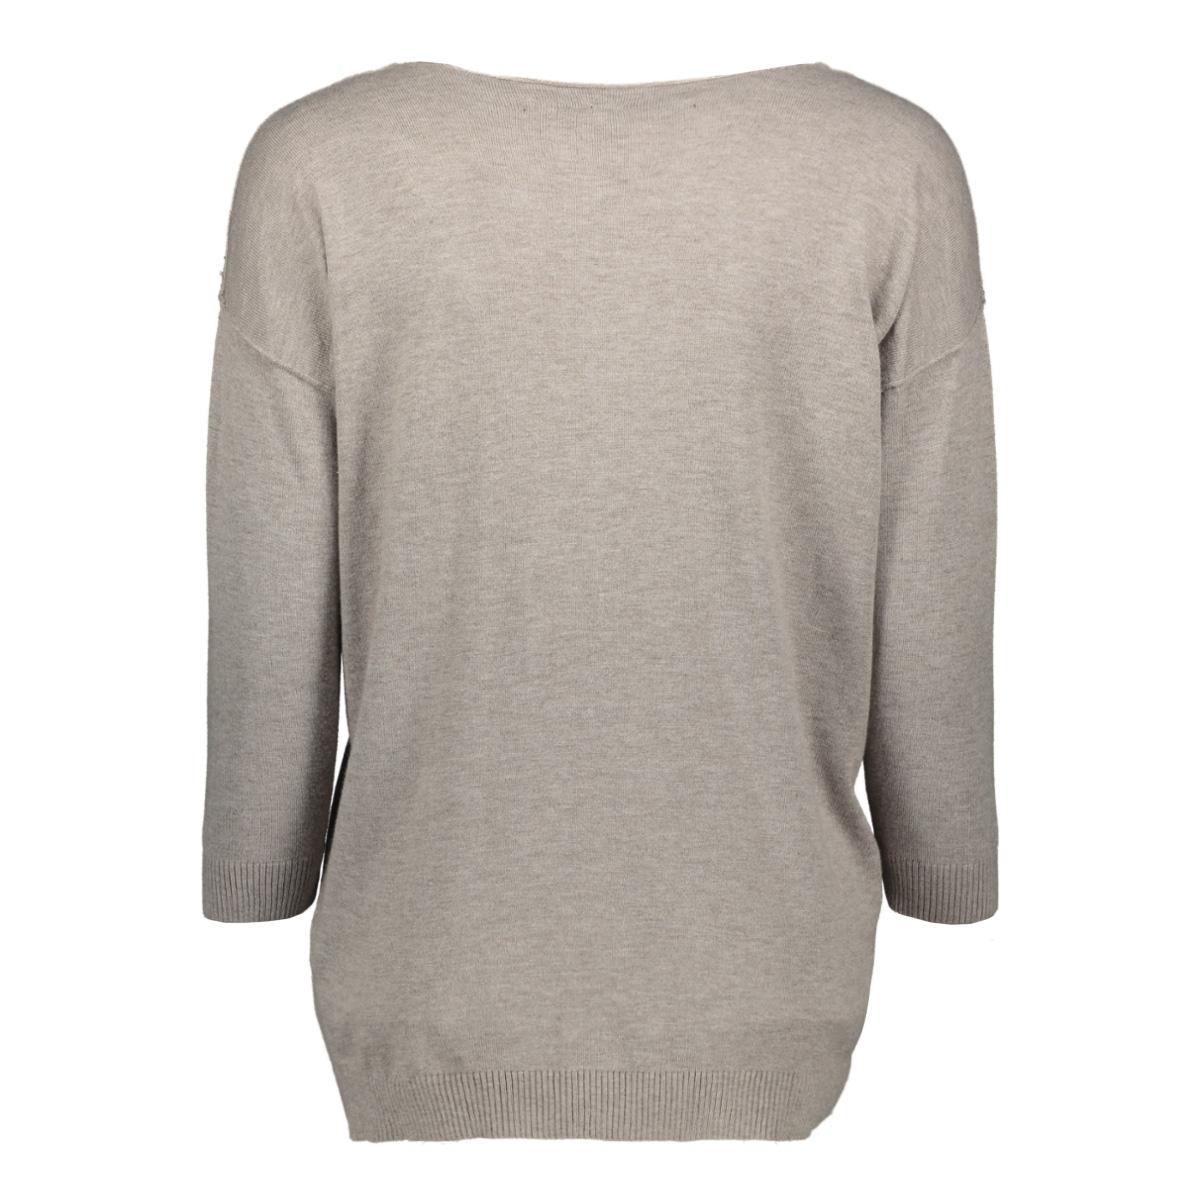 v-neck sweater 20 607 0201 10 days trui 1068 clay